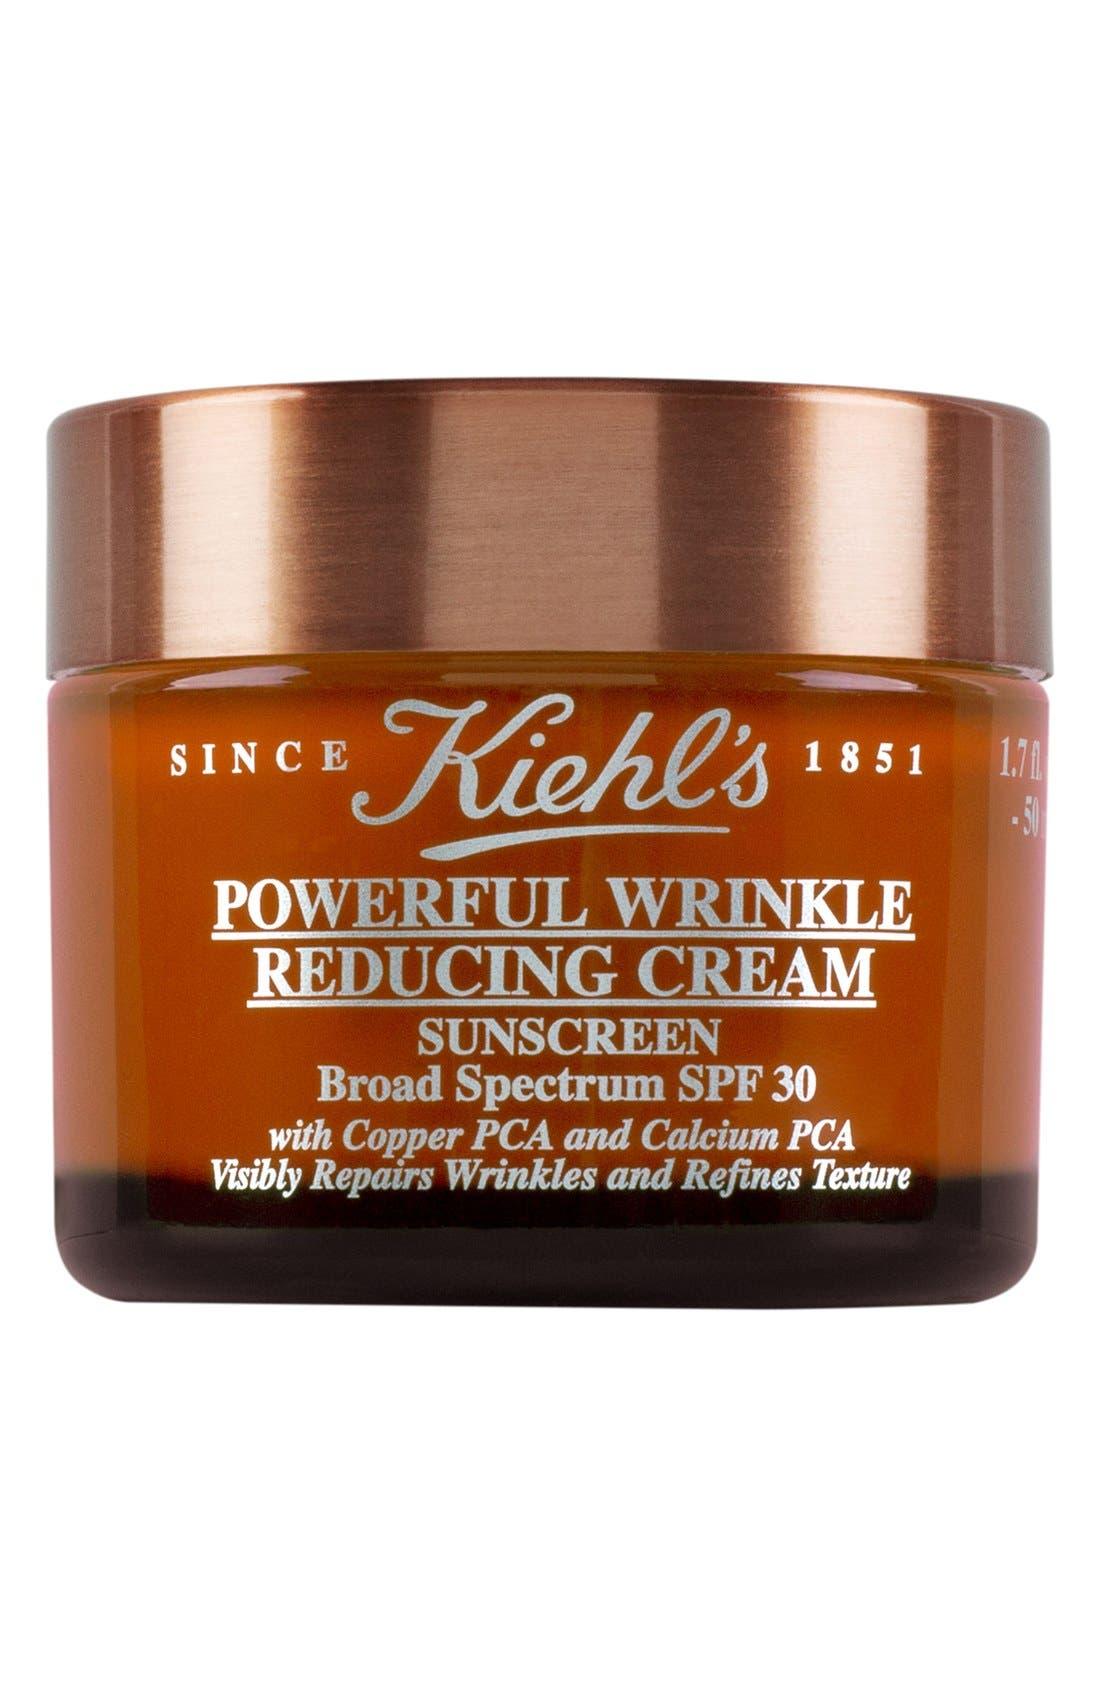 1851 Powerful Wrinkle Reducing Cream Broad Spectrum Spf 30 Sunscreen